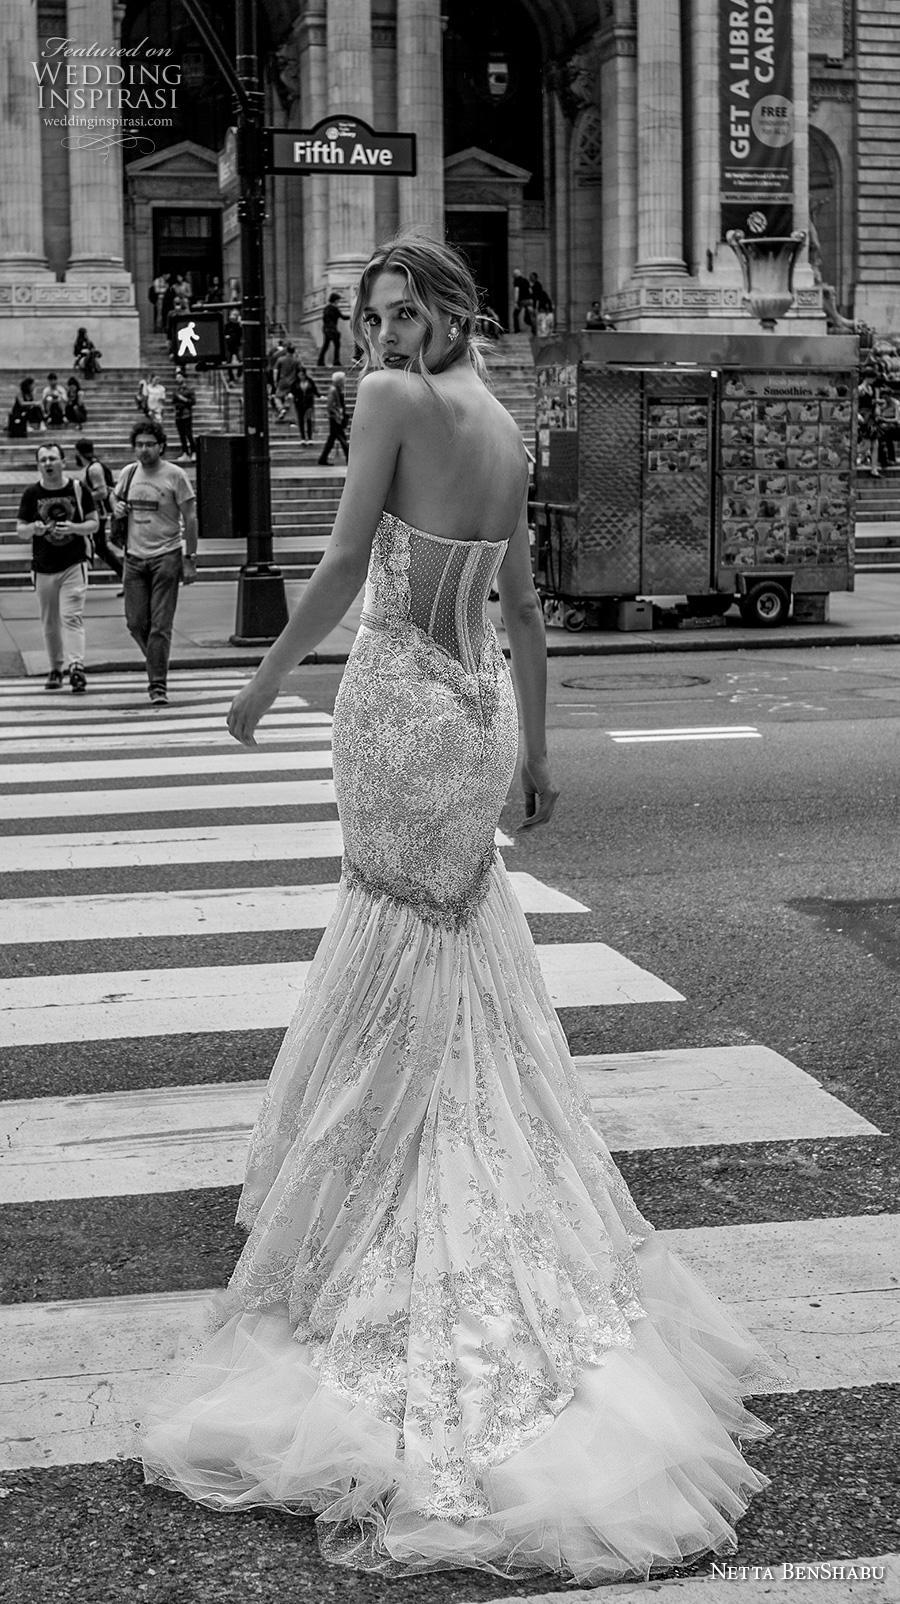 netta benshabu fall 2019 bridal strapless sweetheart neckline full embellishment elegant glamorous mermaid wedding dress mid back medium train (4) bv